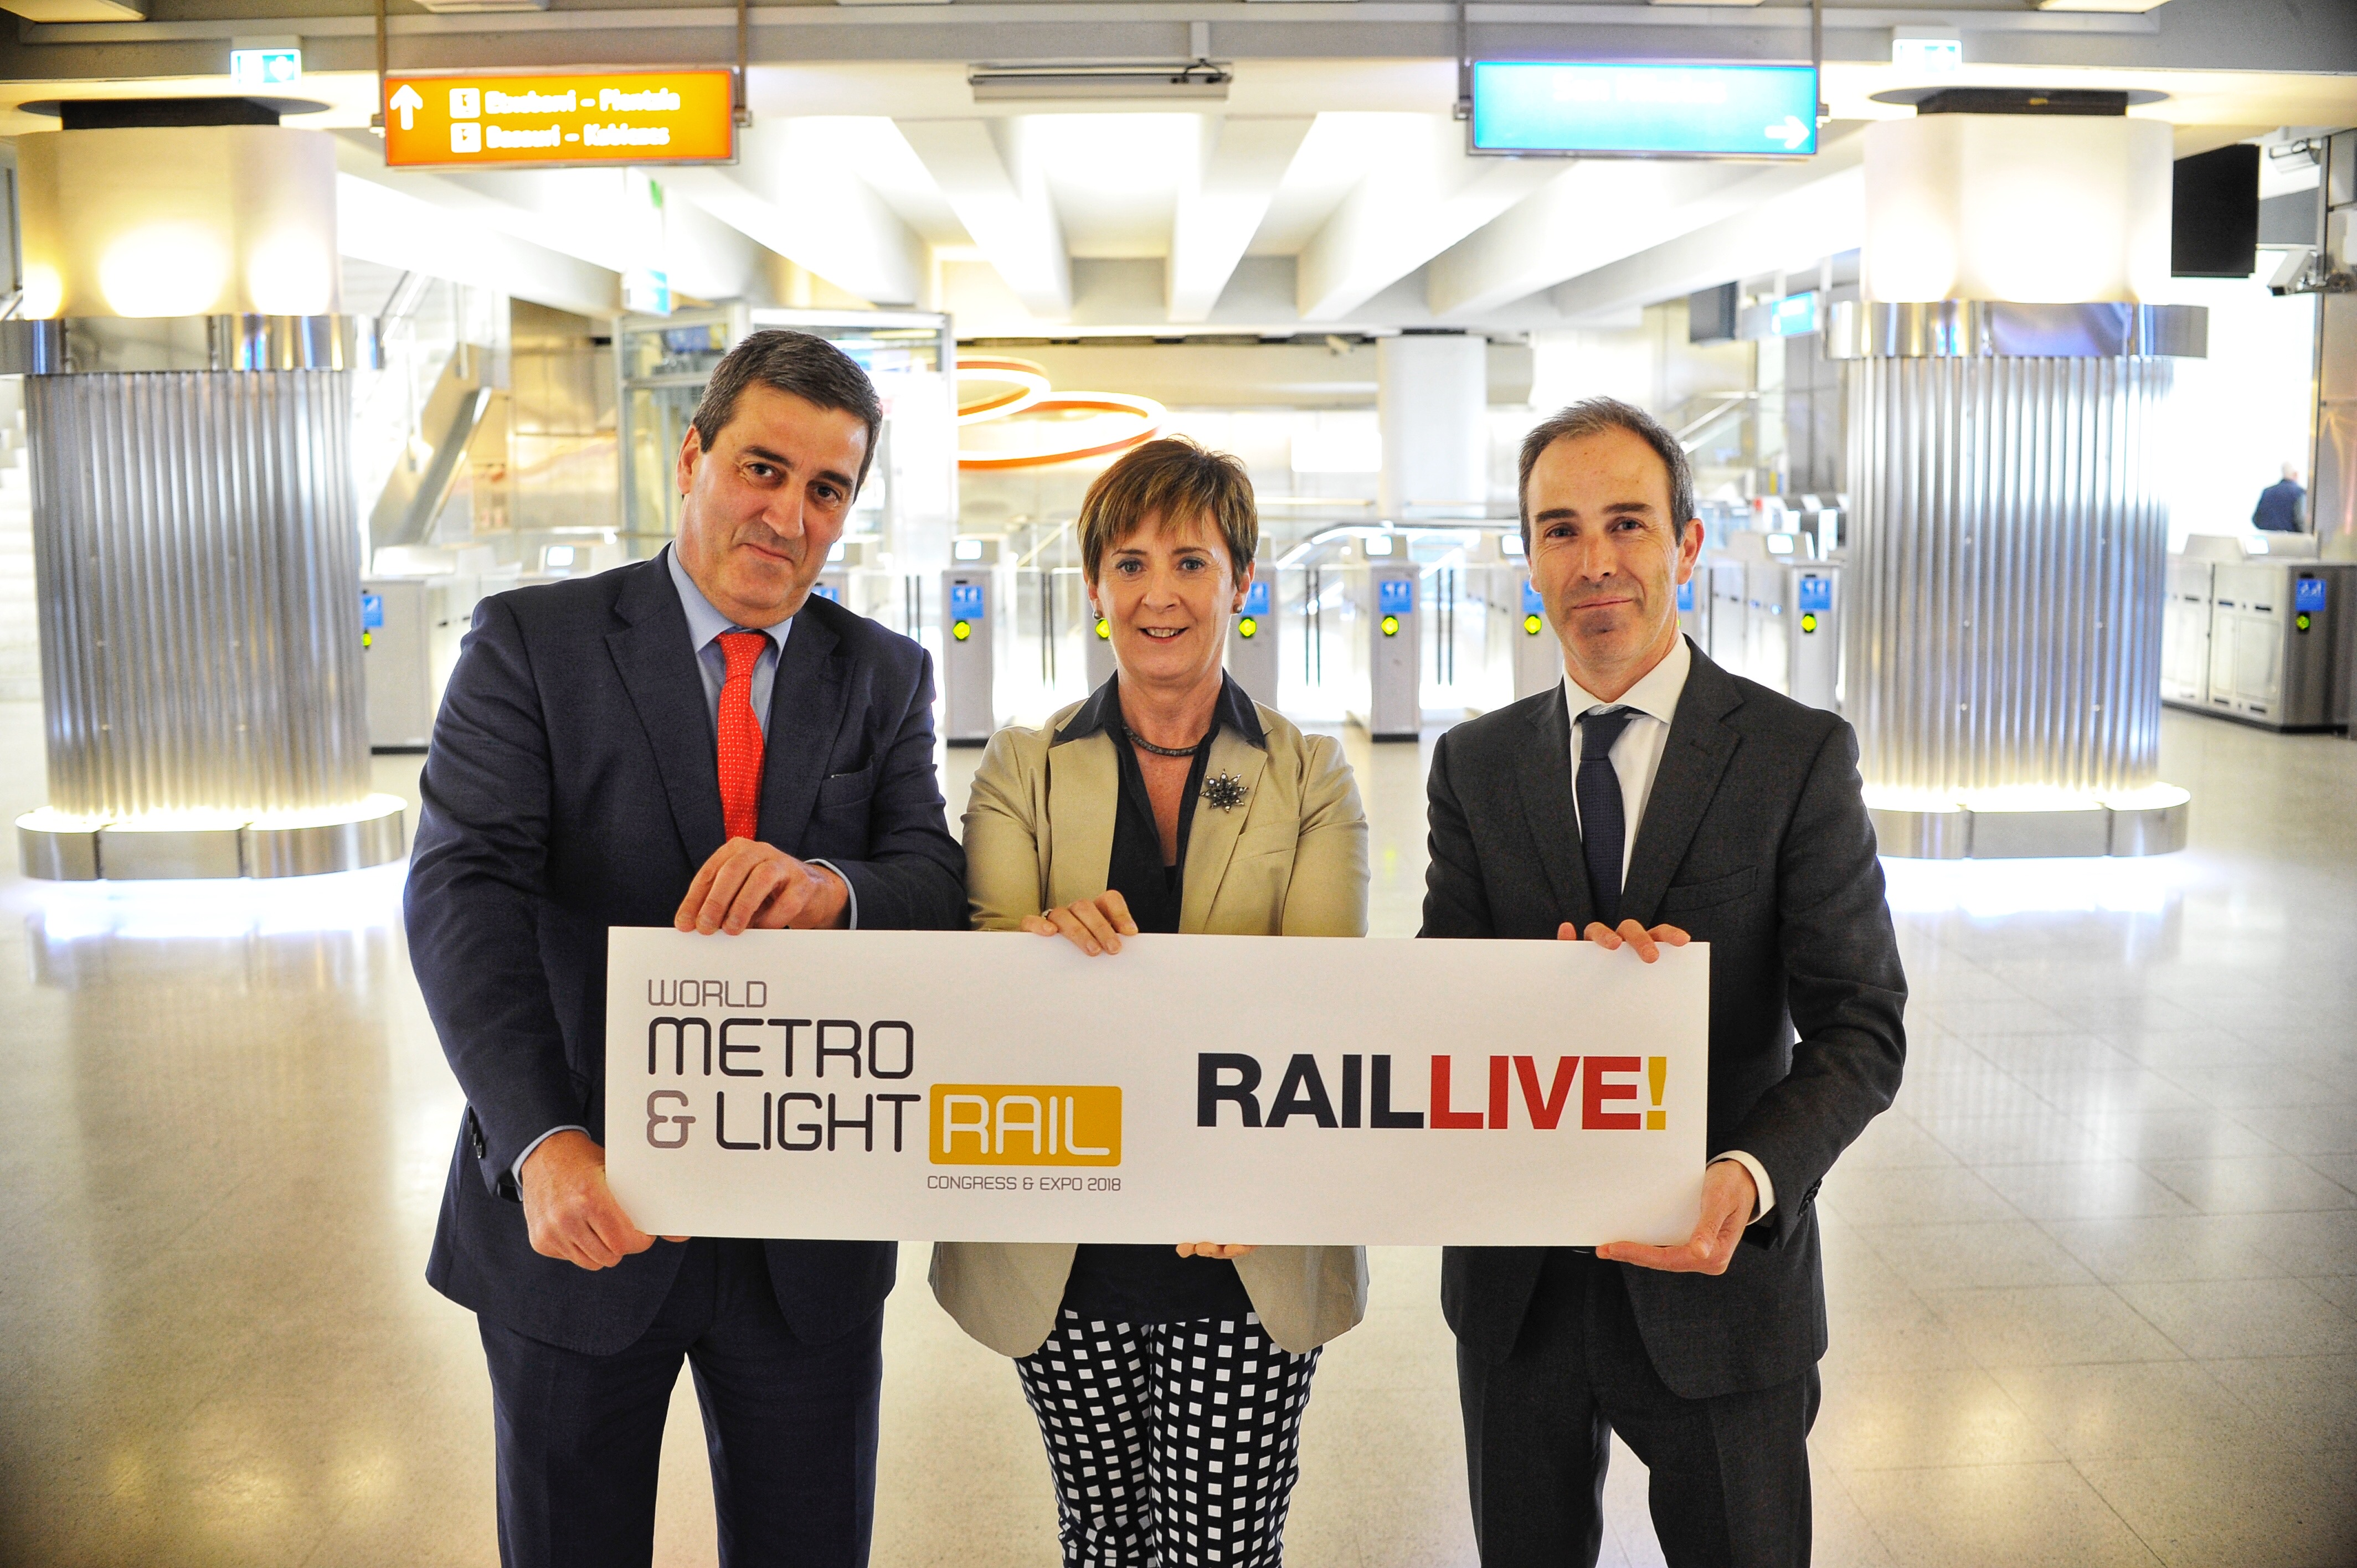 metro_rail_03.jpg